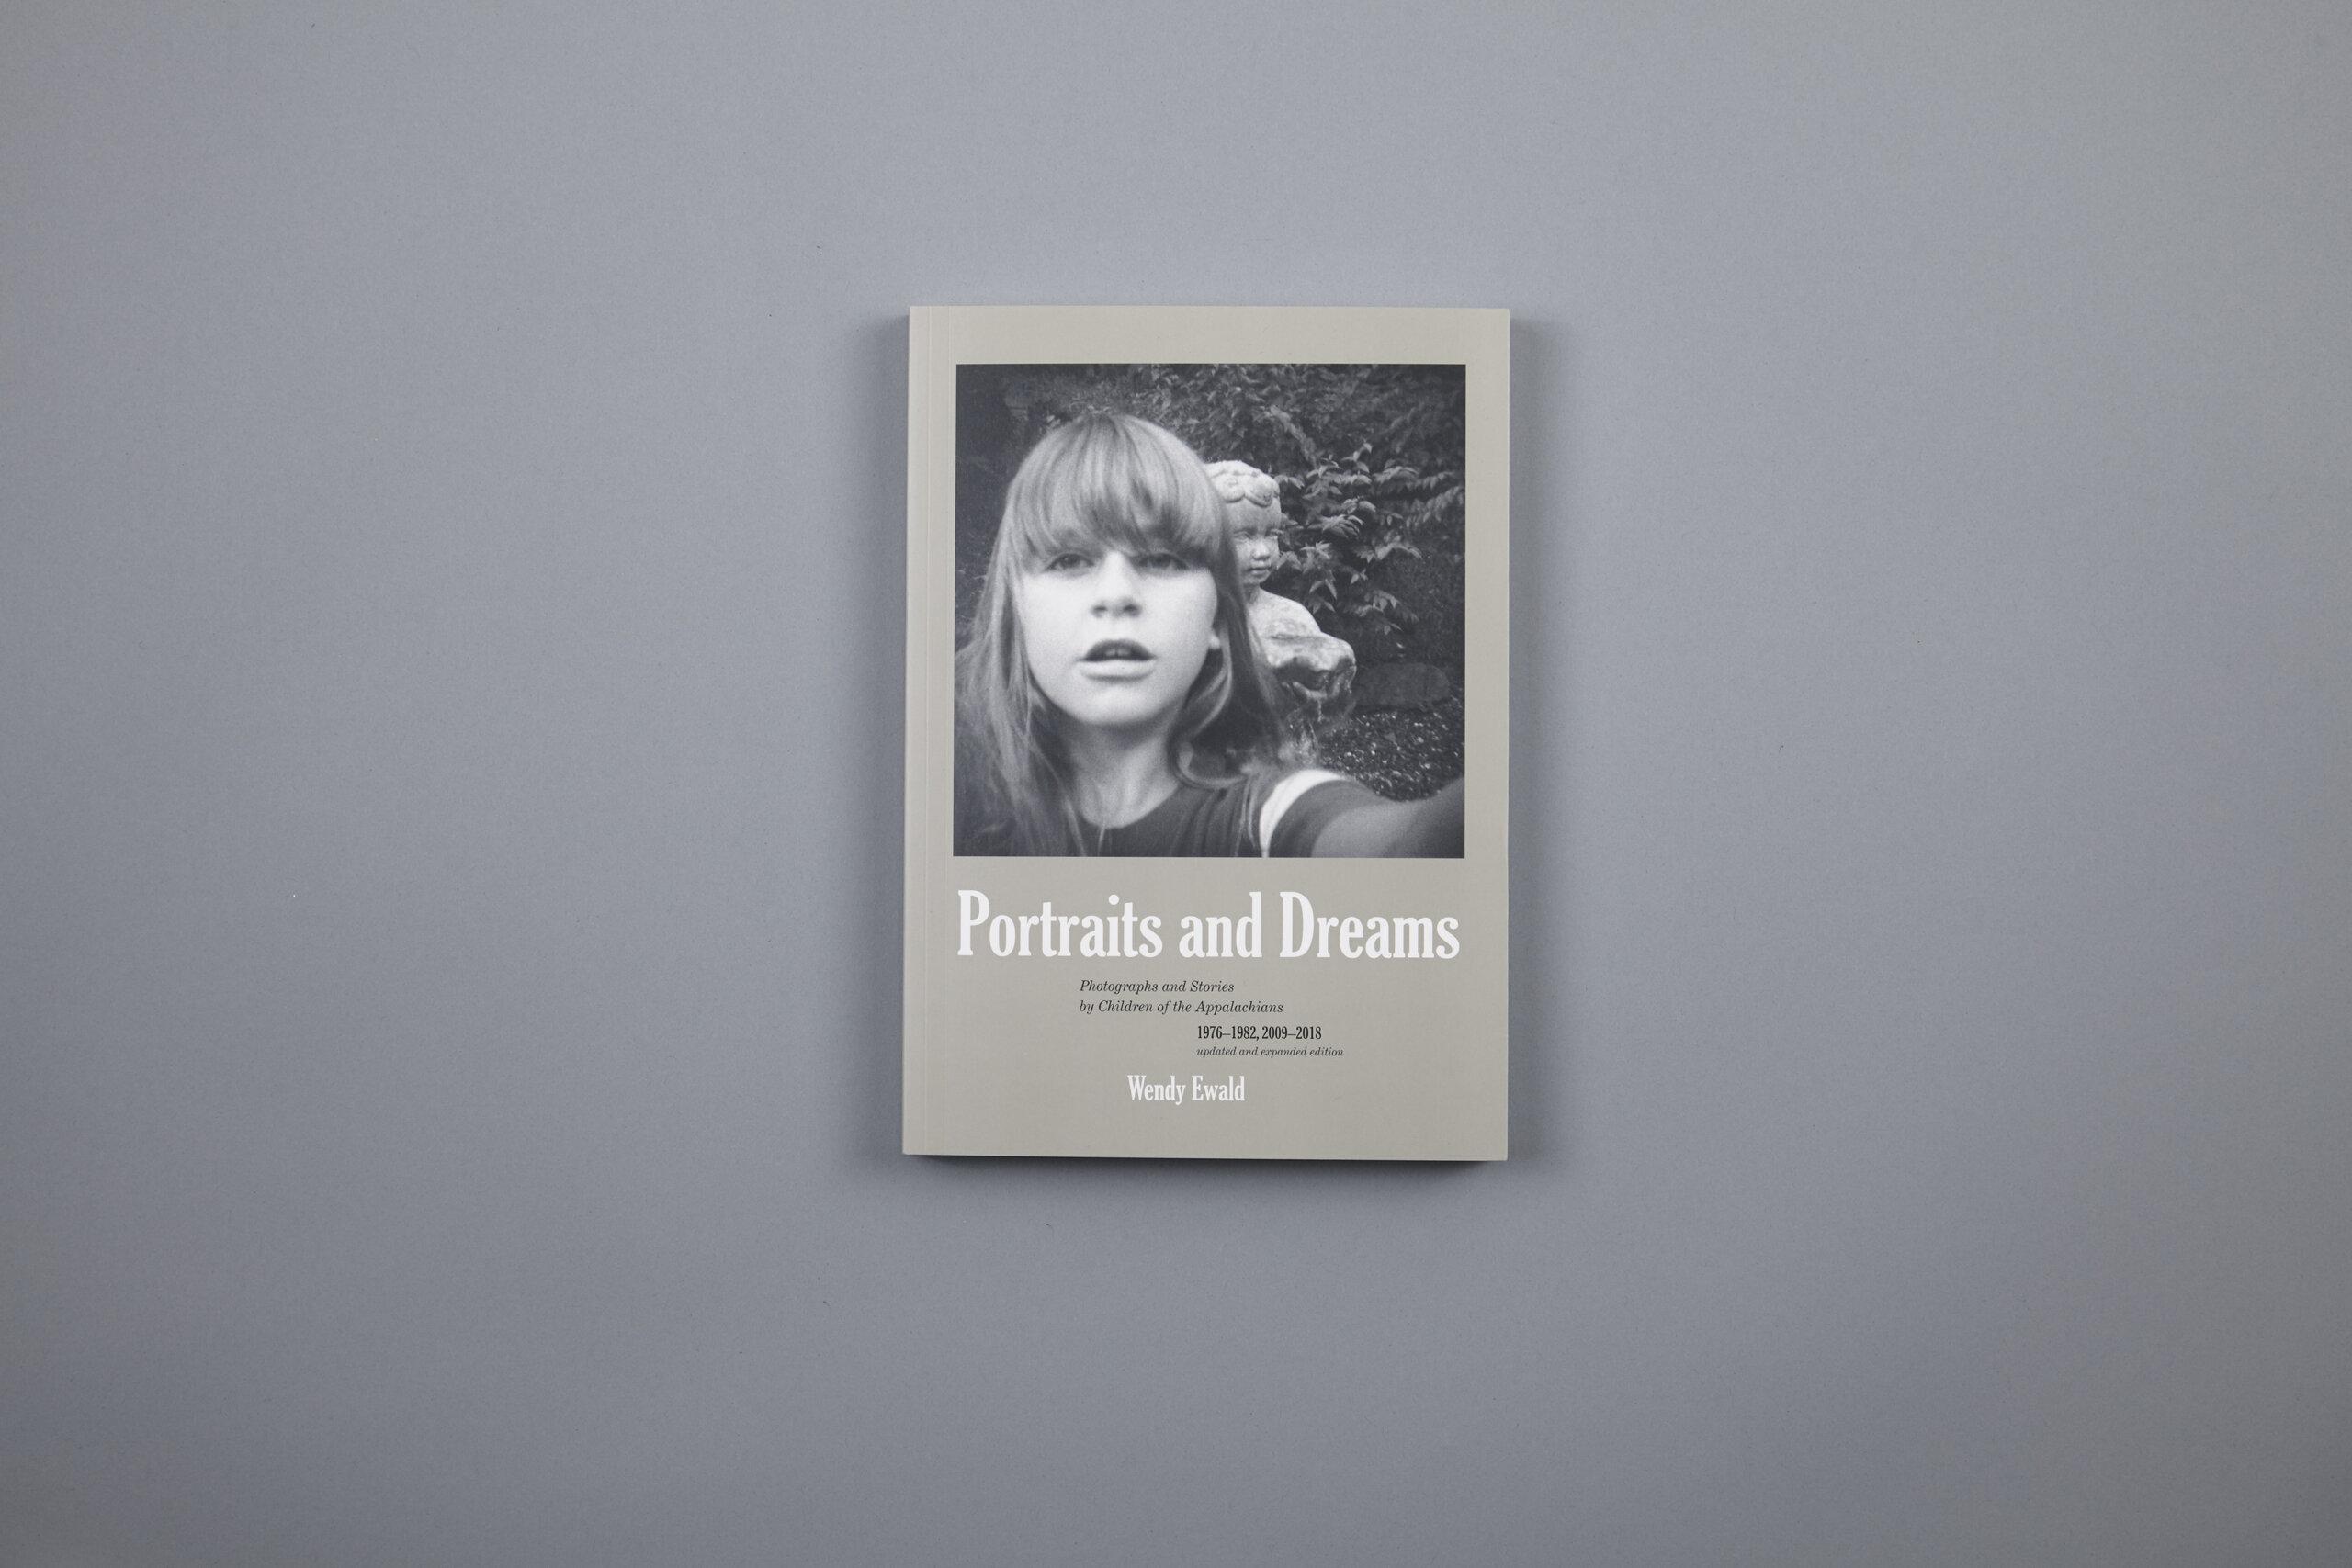 ewald-portraits-and-dreams-delpire-co-1